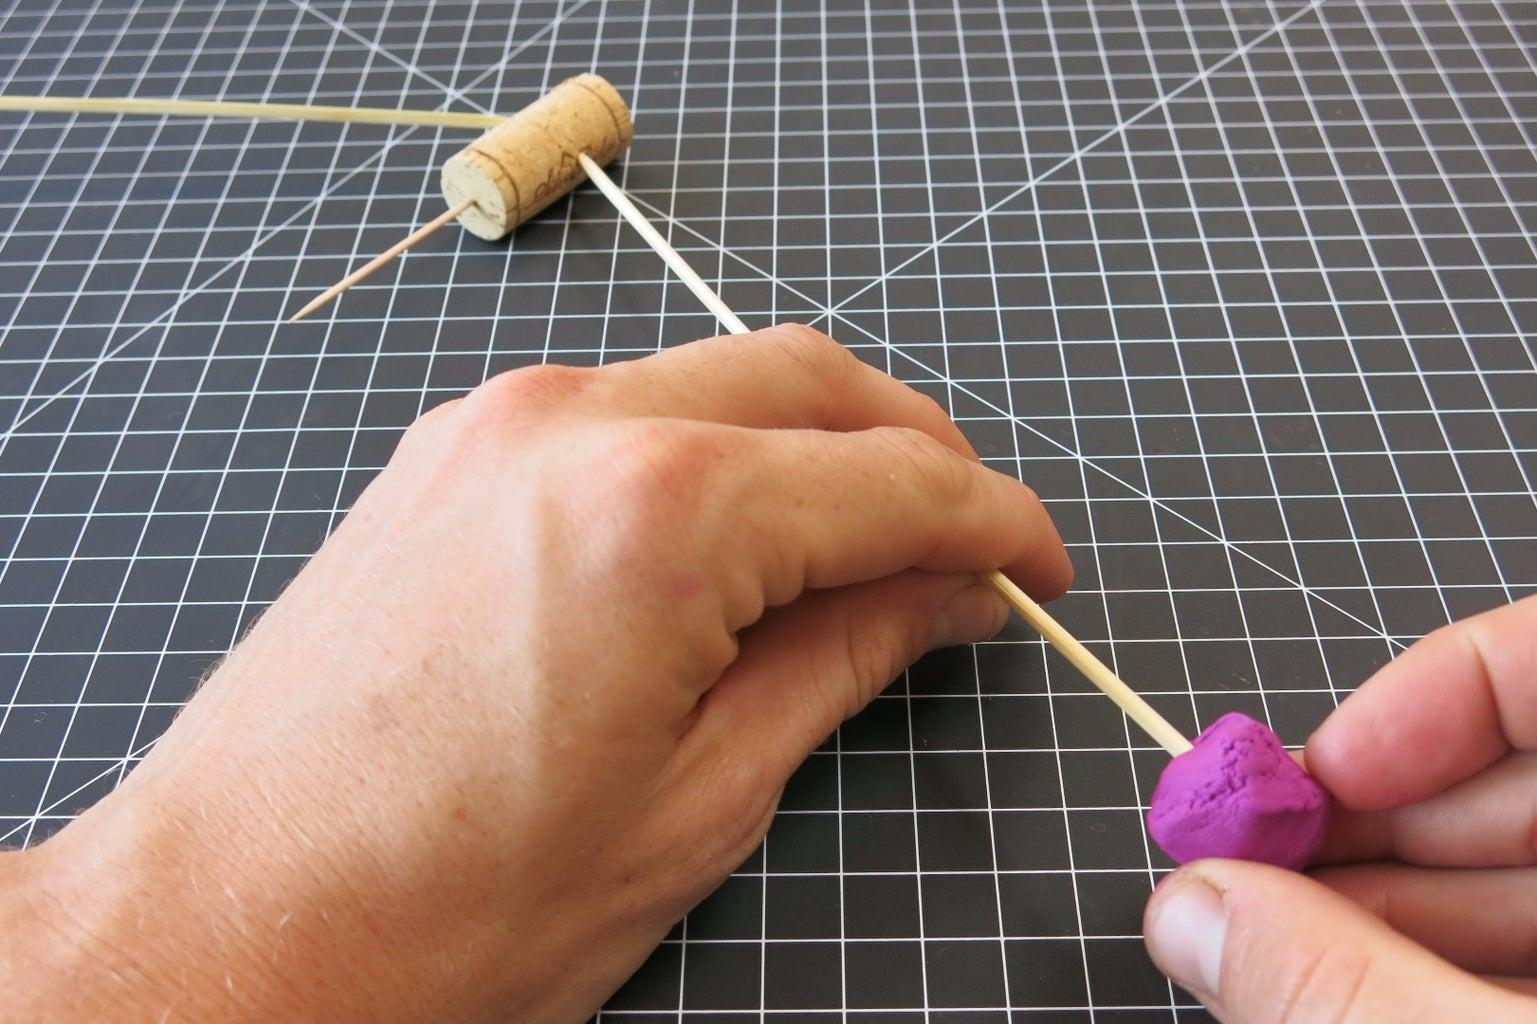 Insert Sticks and Add Clay!